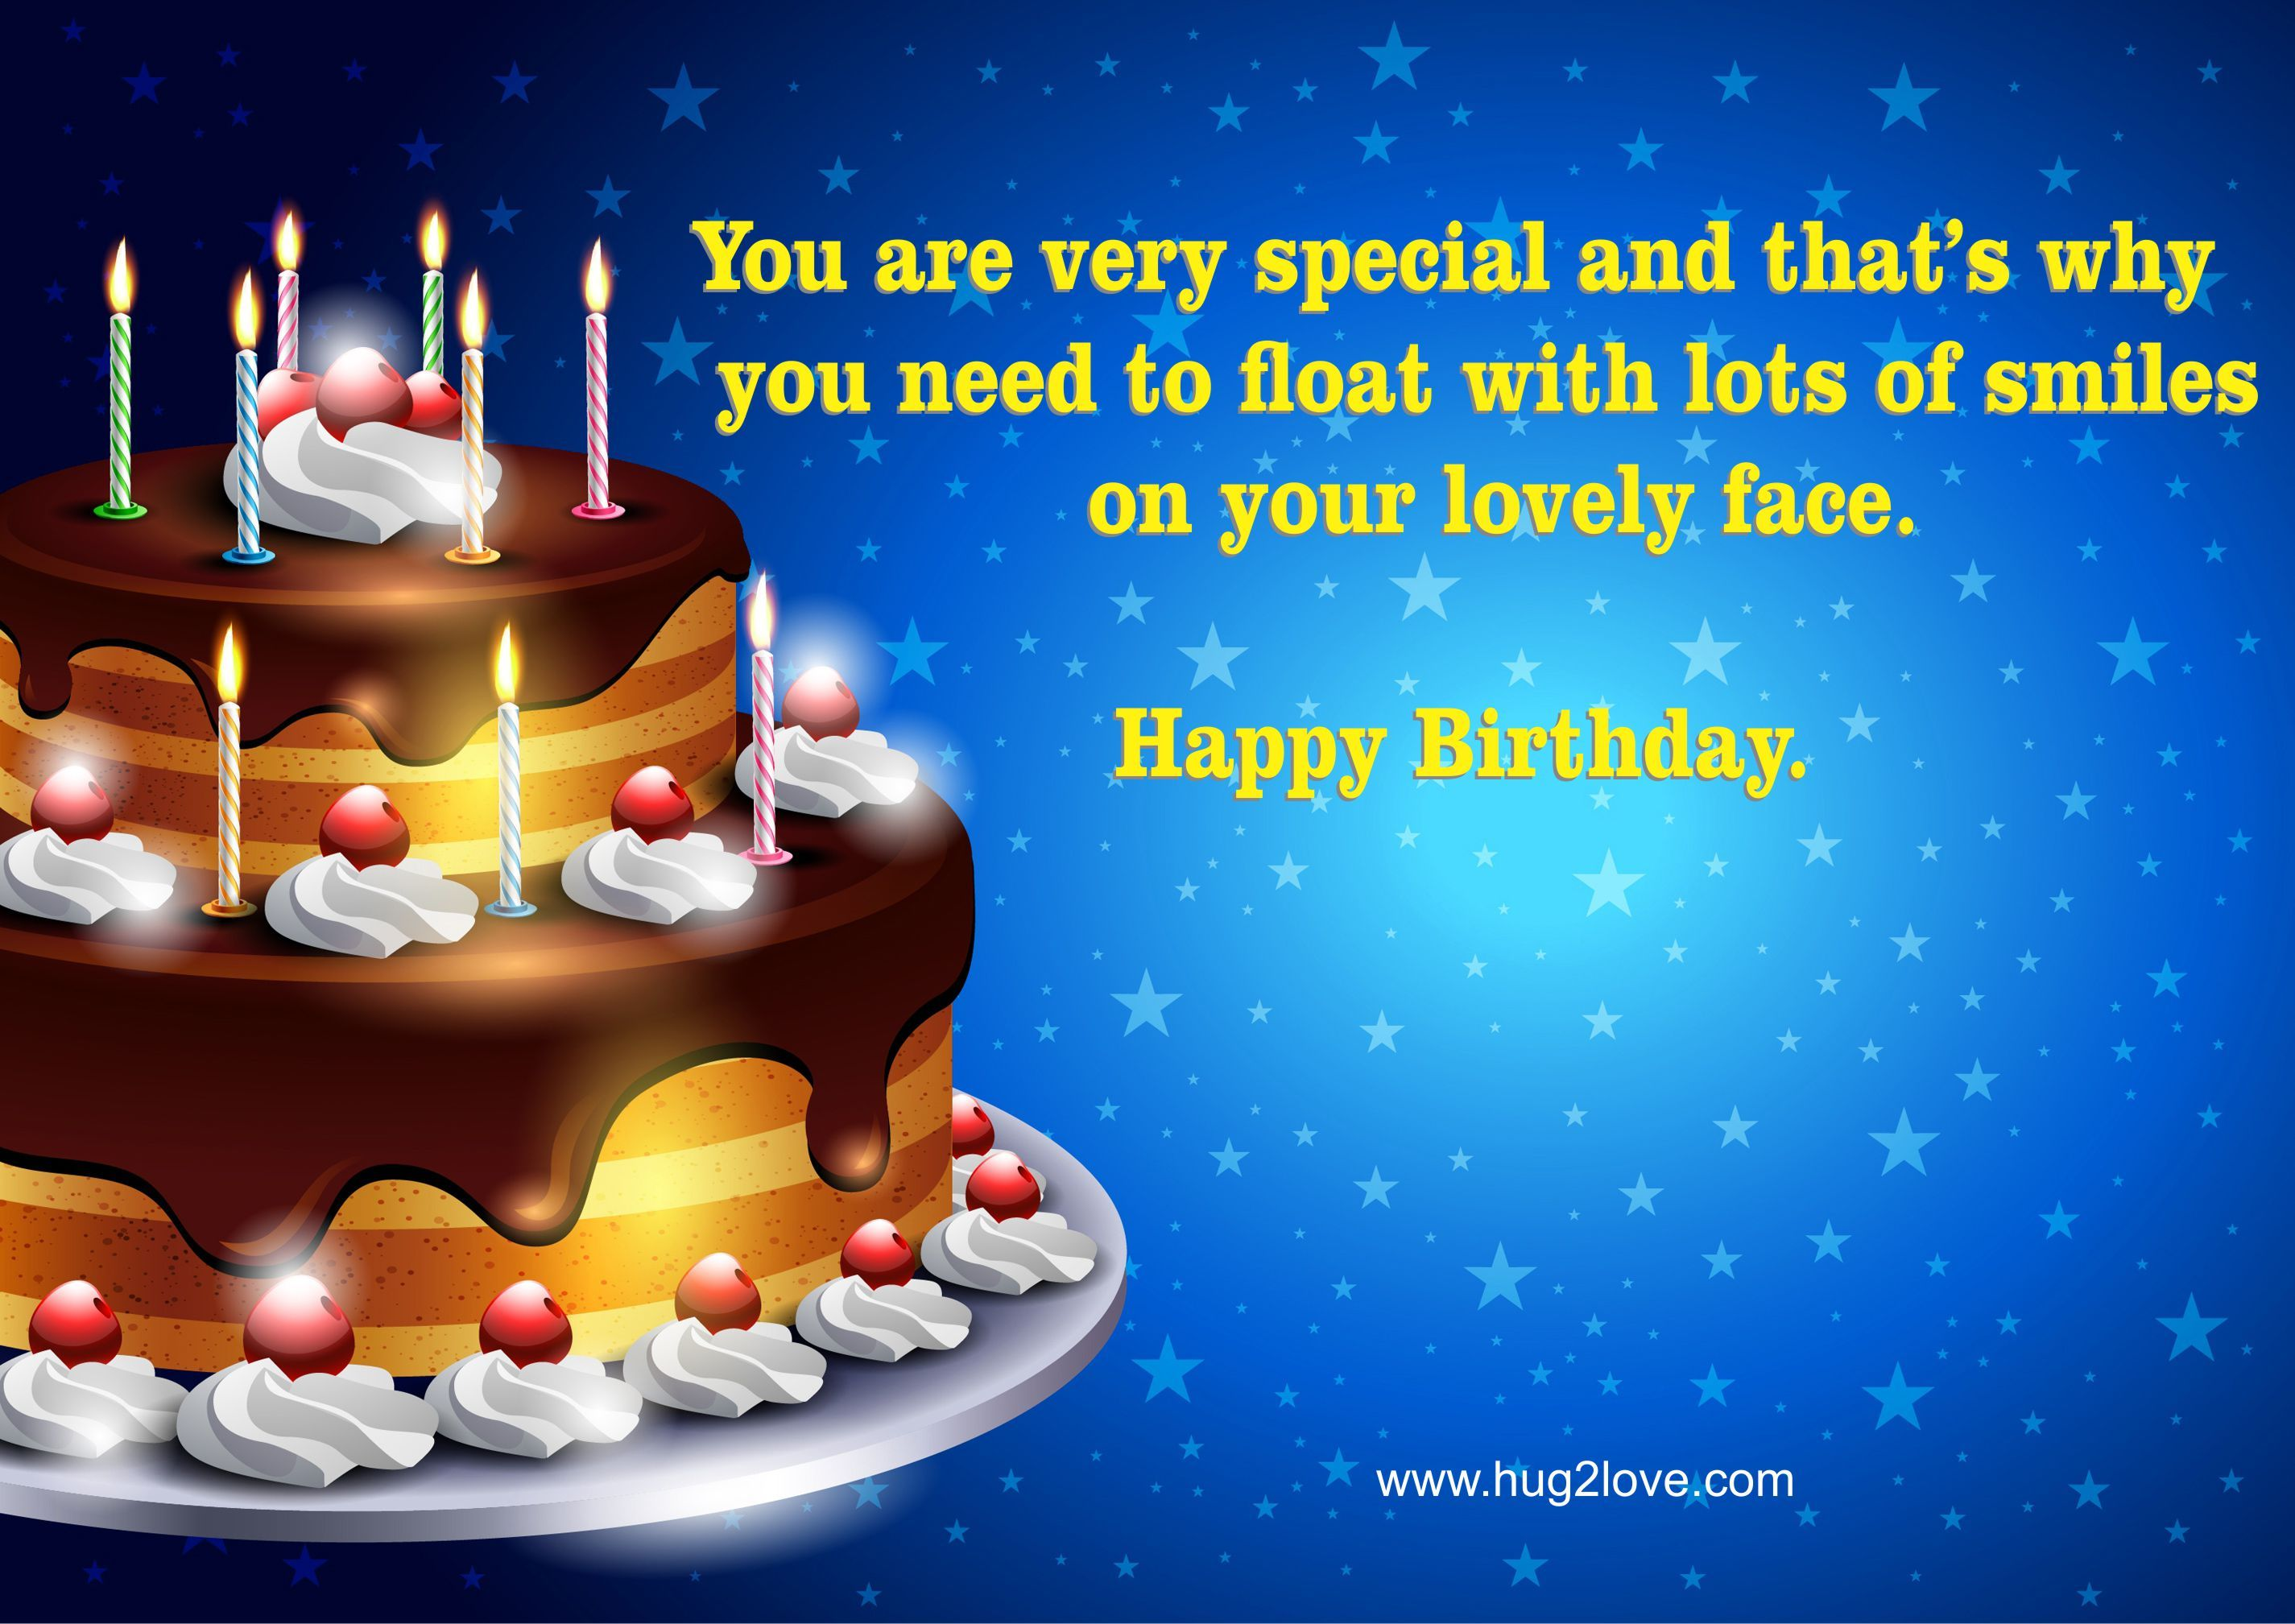 Happy Birthday Wishes Images Hd Happy Birthday Wishes Images Birthday Wishes And Images Birthday